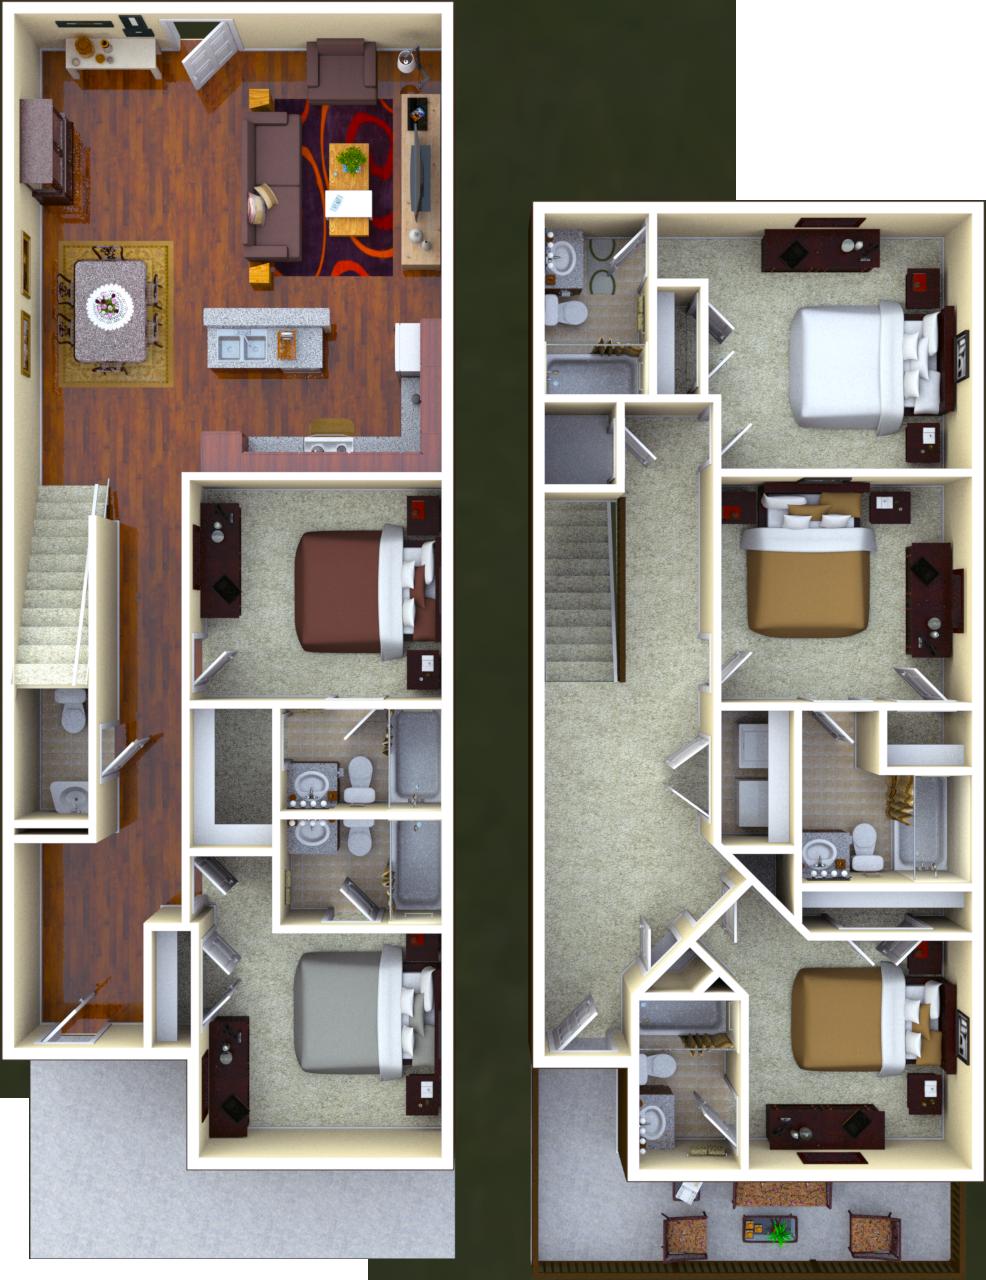 Rutherford 5 BR 5.5 BATH Floor Plan